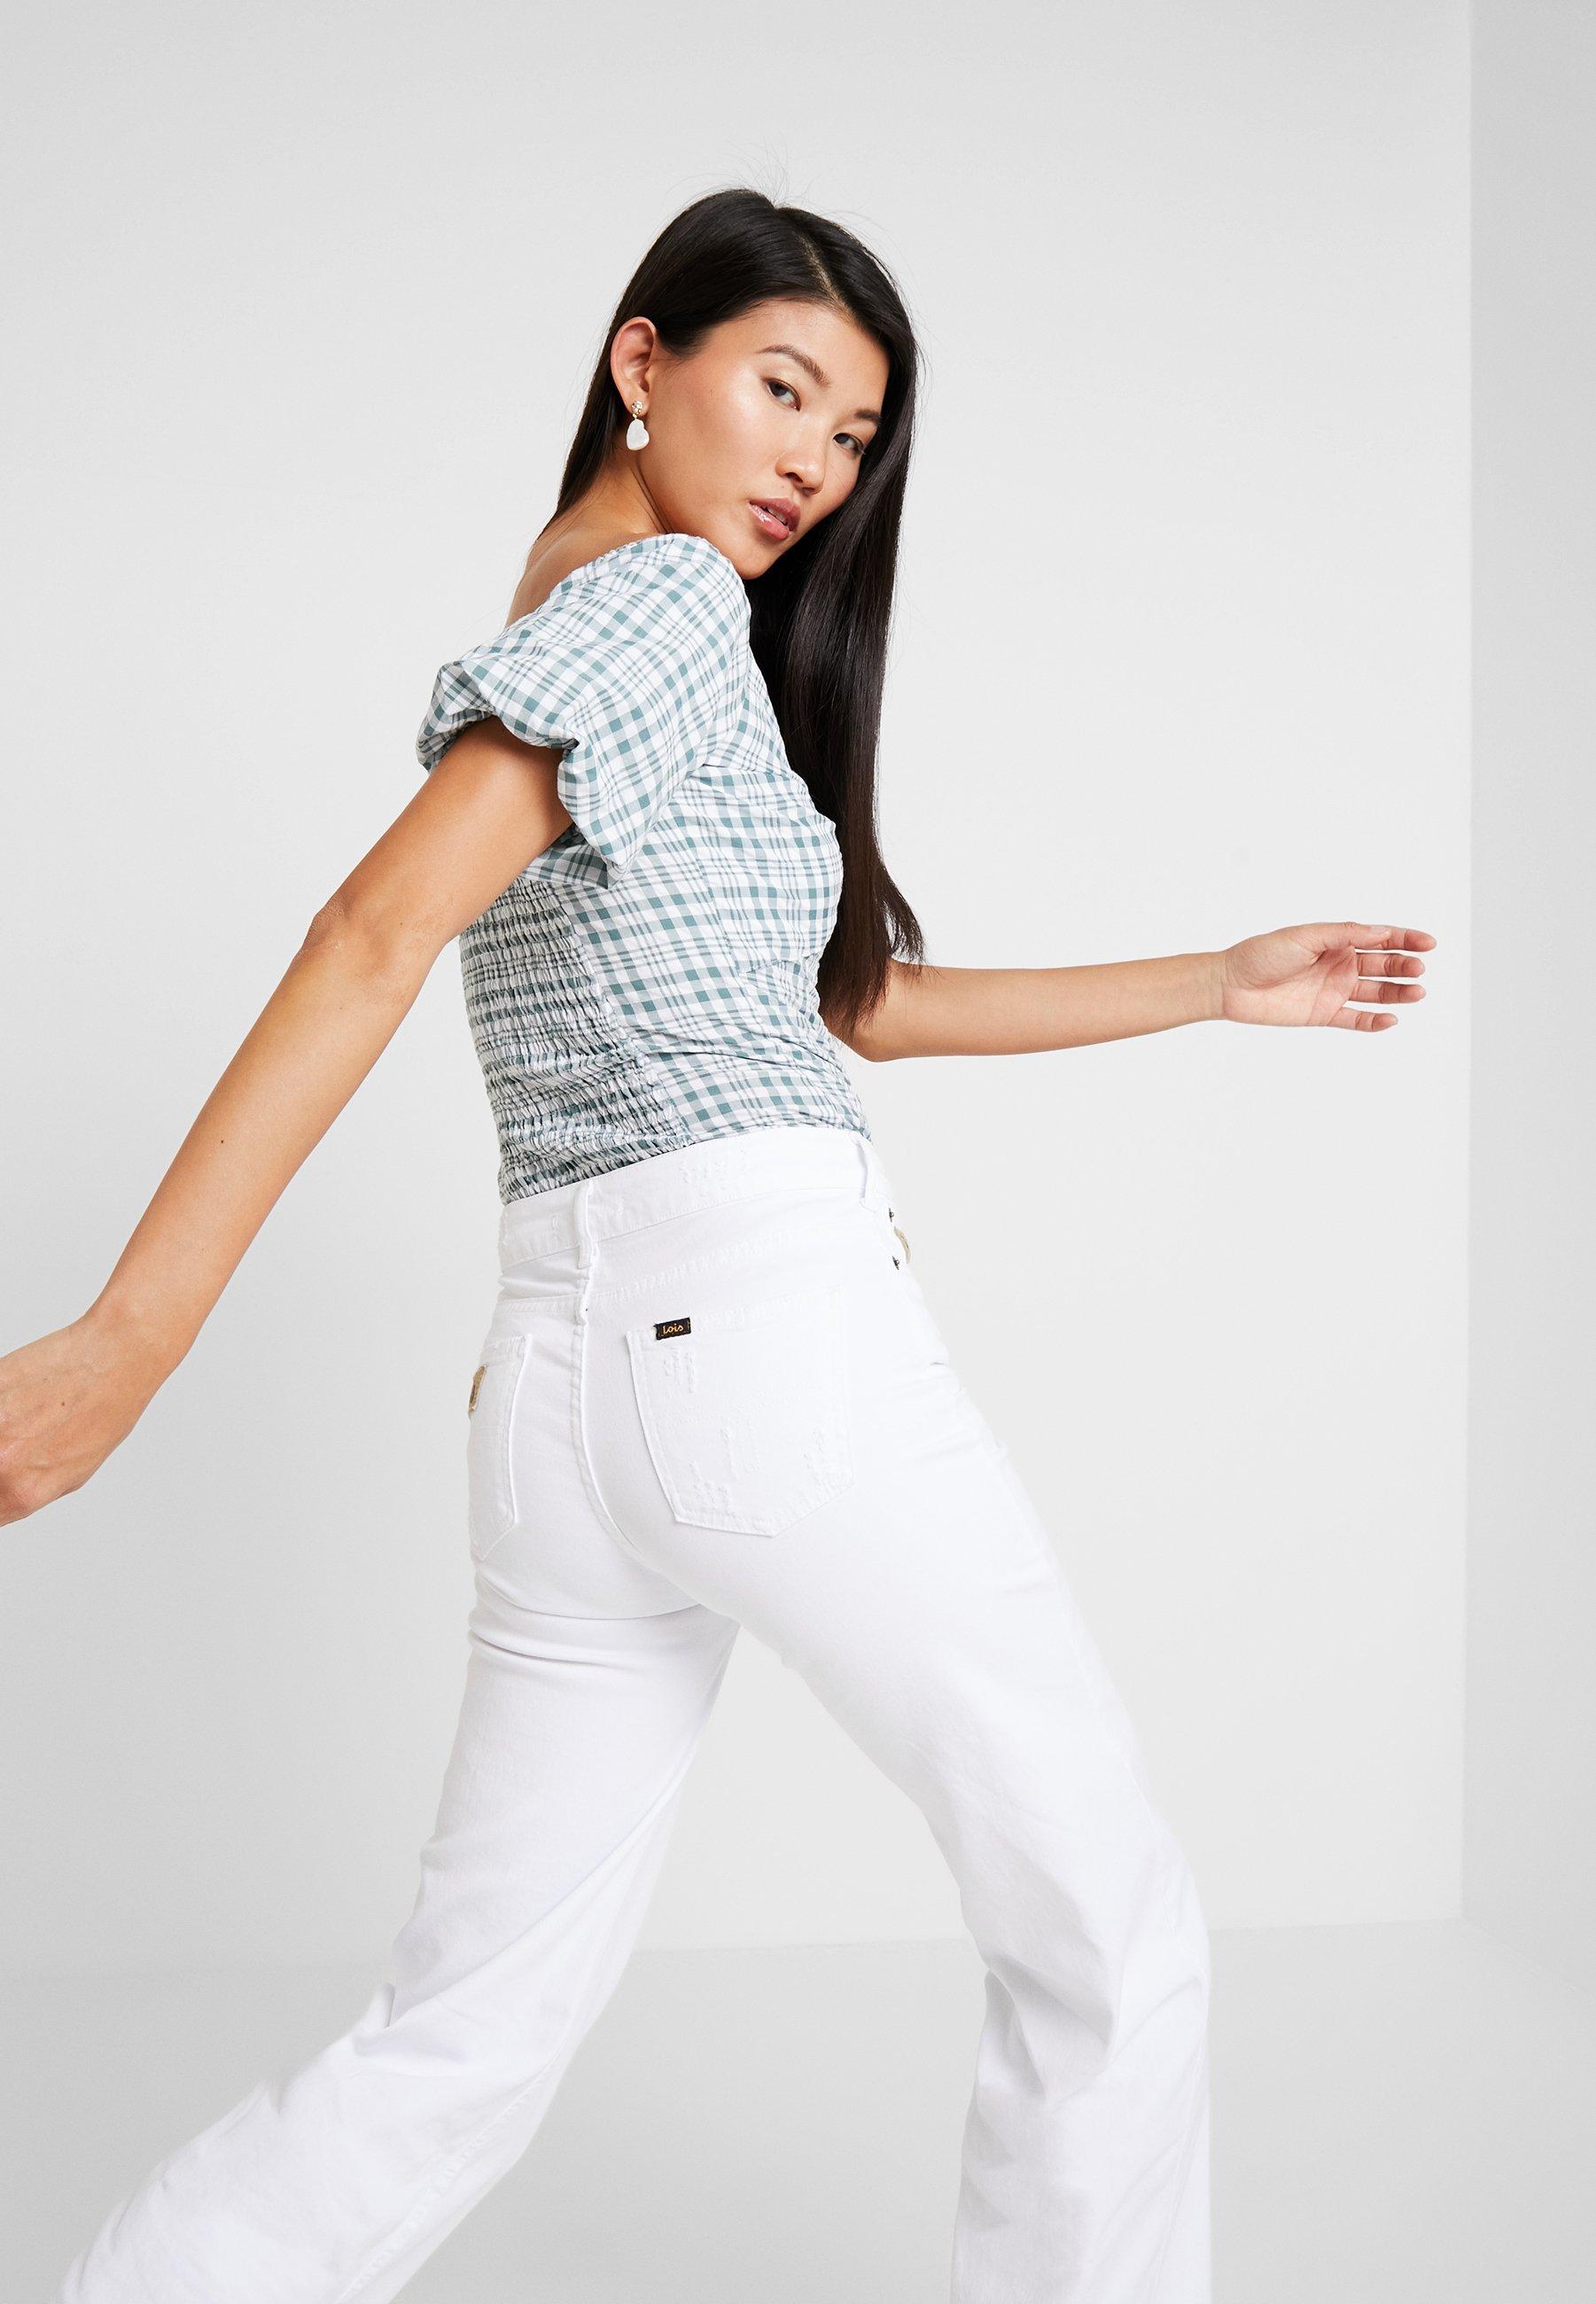 White Lois White Lois Flare Flare PalazzoJean PalazzoJean Jeans Jeans OkPXuZiT